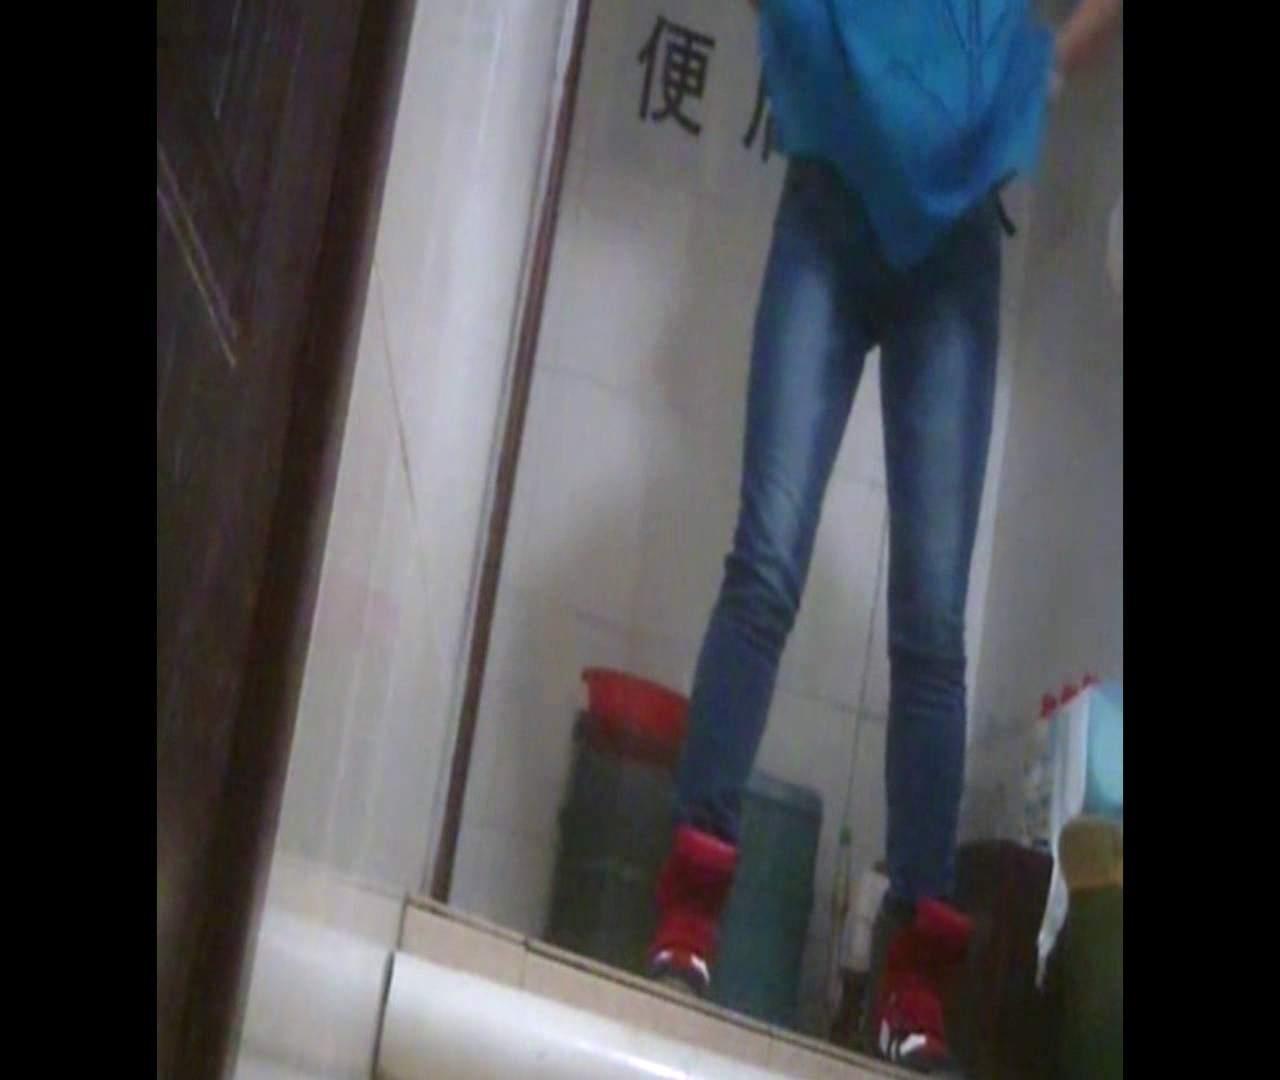 Vol.37 豊満な胸を持つマッシュルームカットな彼女 洗面所シーン 性交動画流出 57画像 53